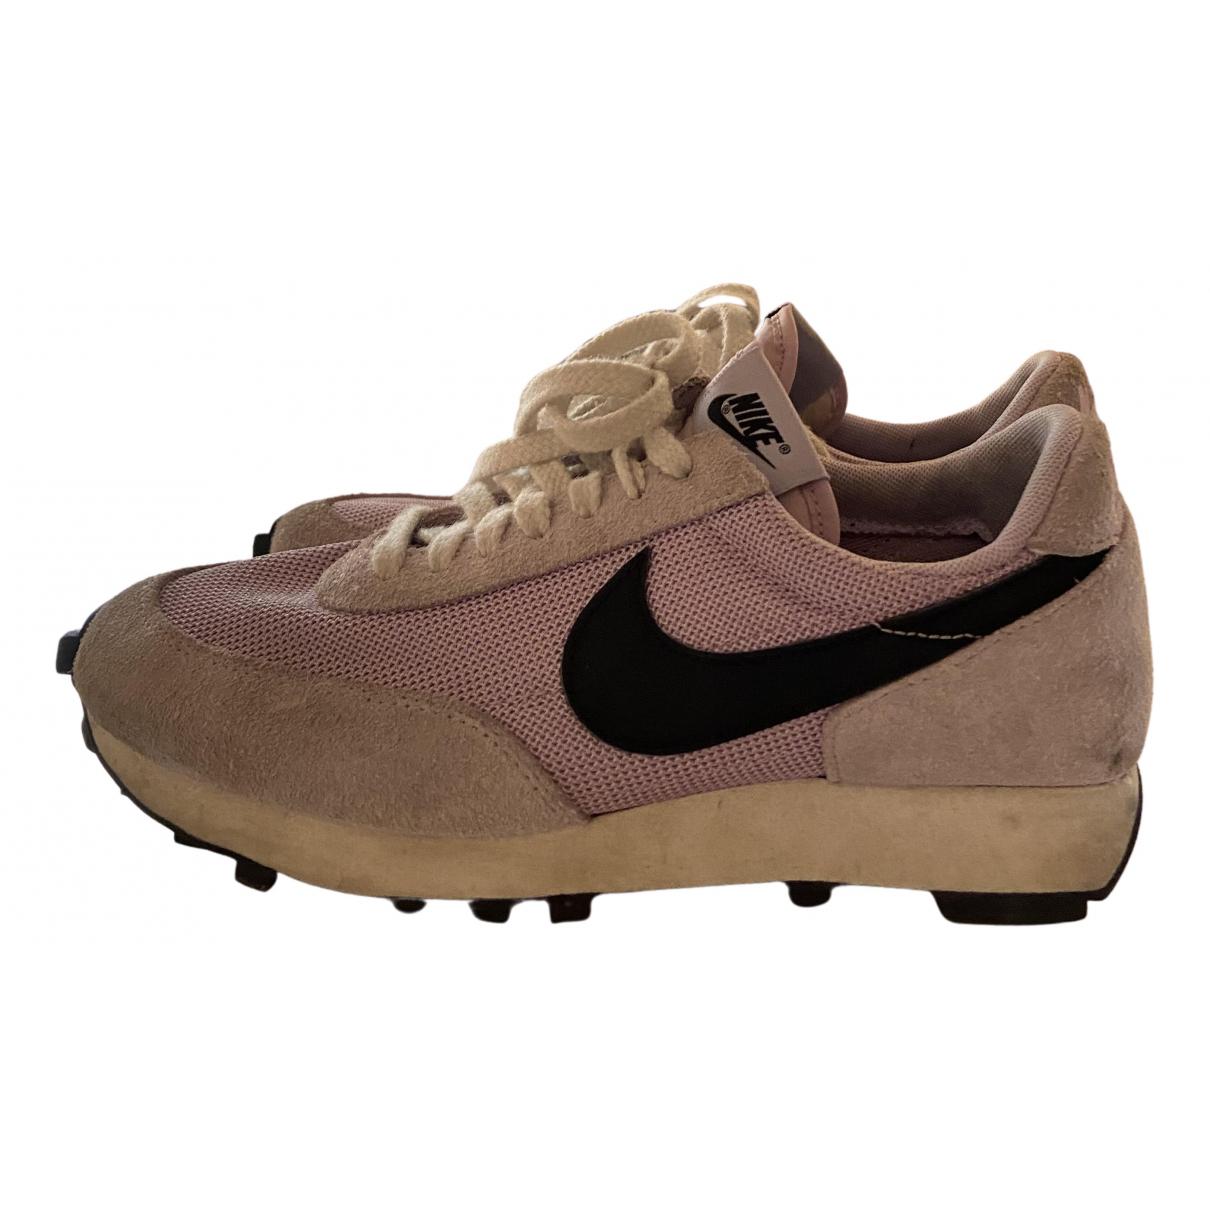 Nike N Purple Leather Trainers for Women 38.5 EU